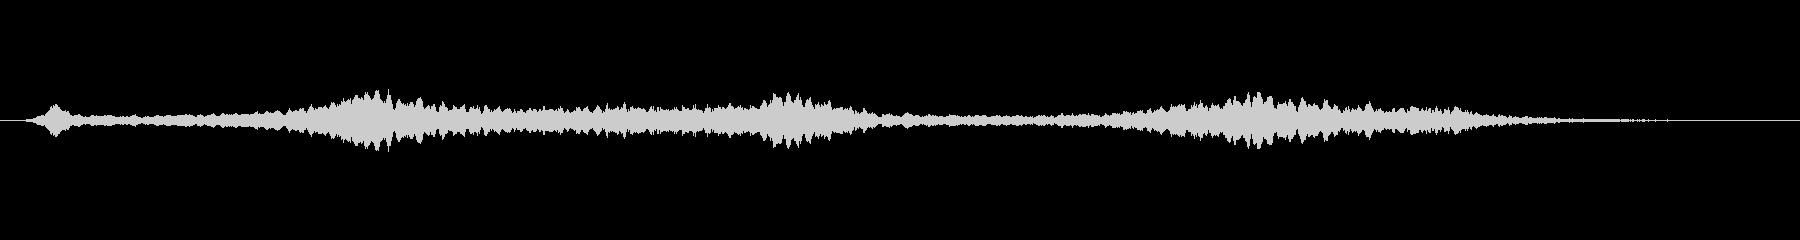 FI UFO ホバー01の未再生の波形